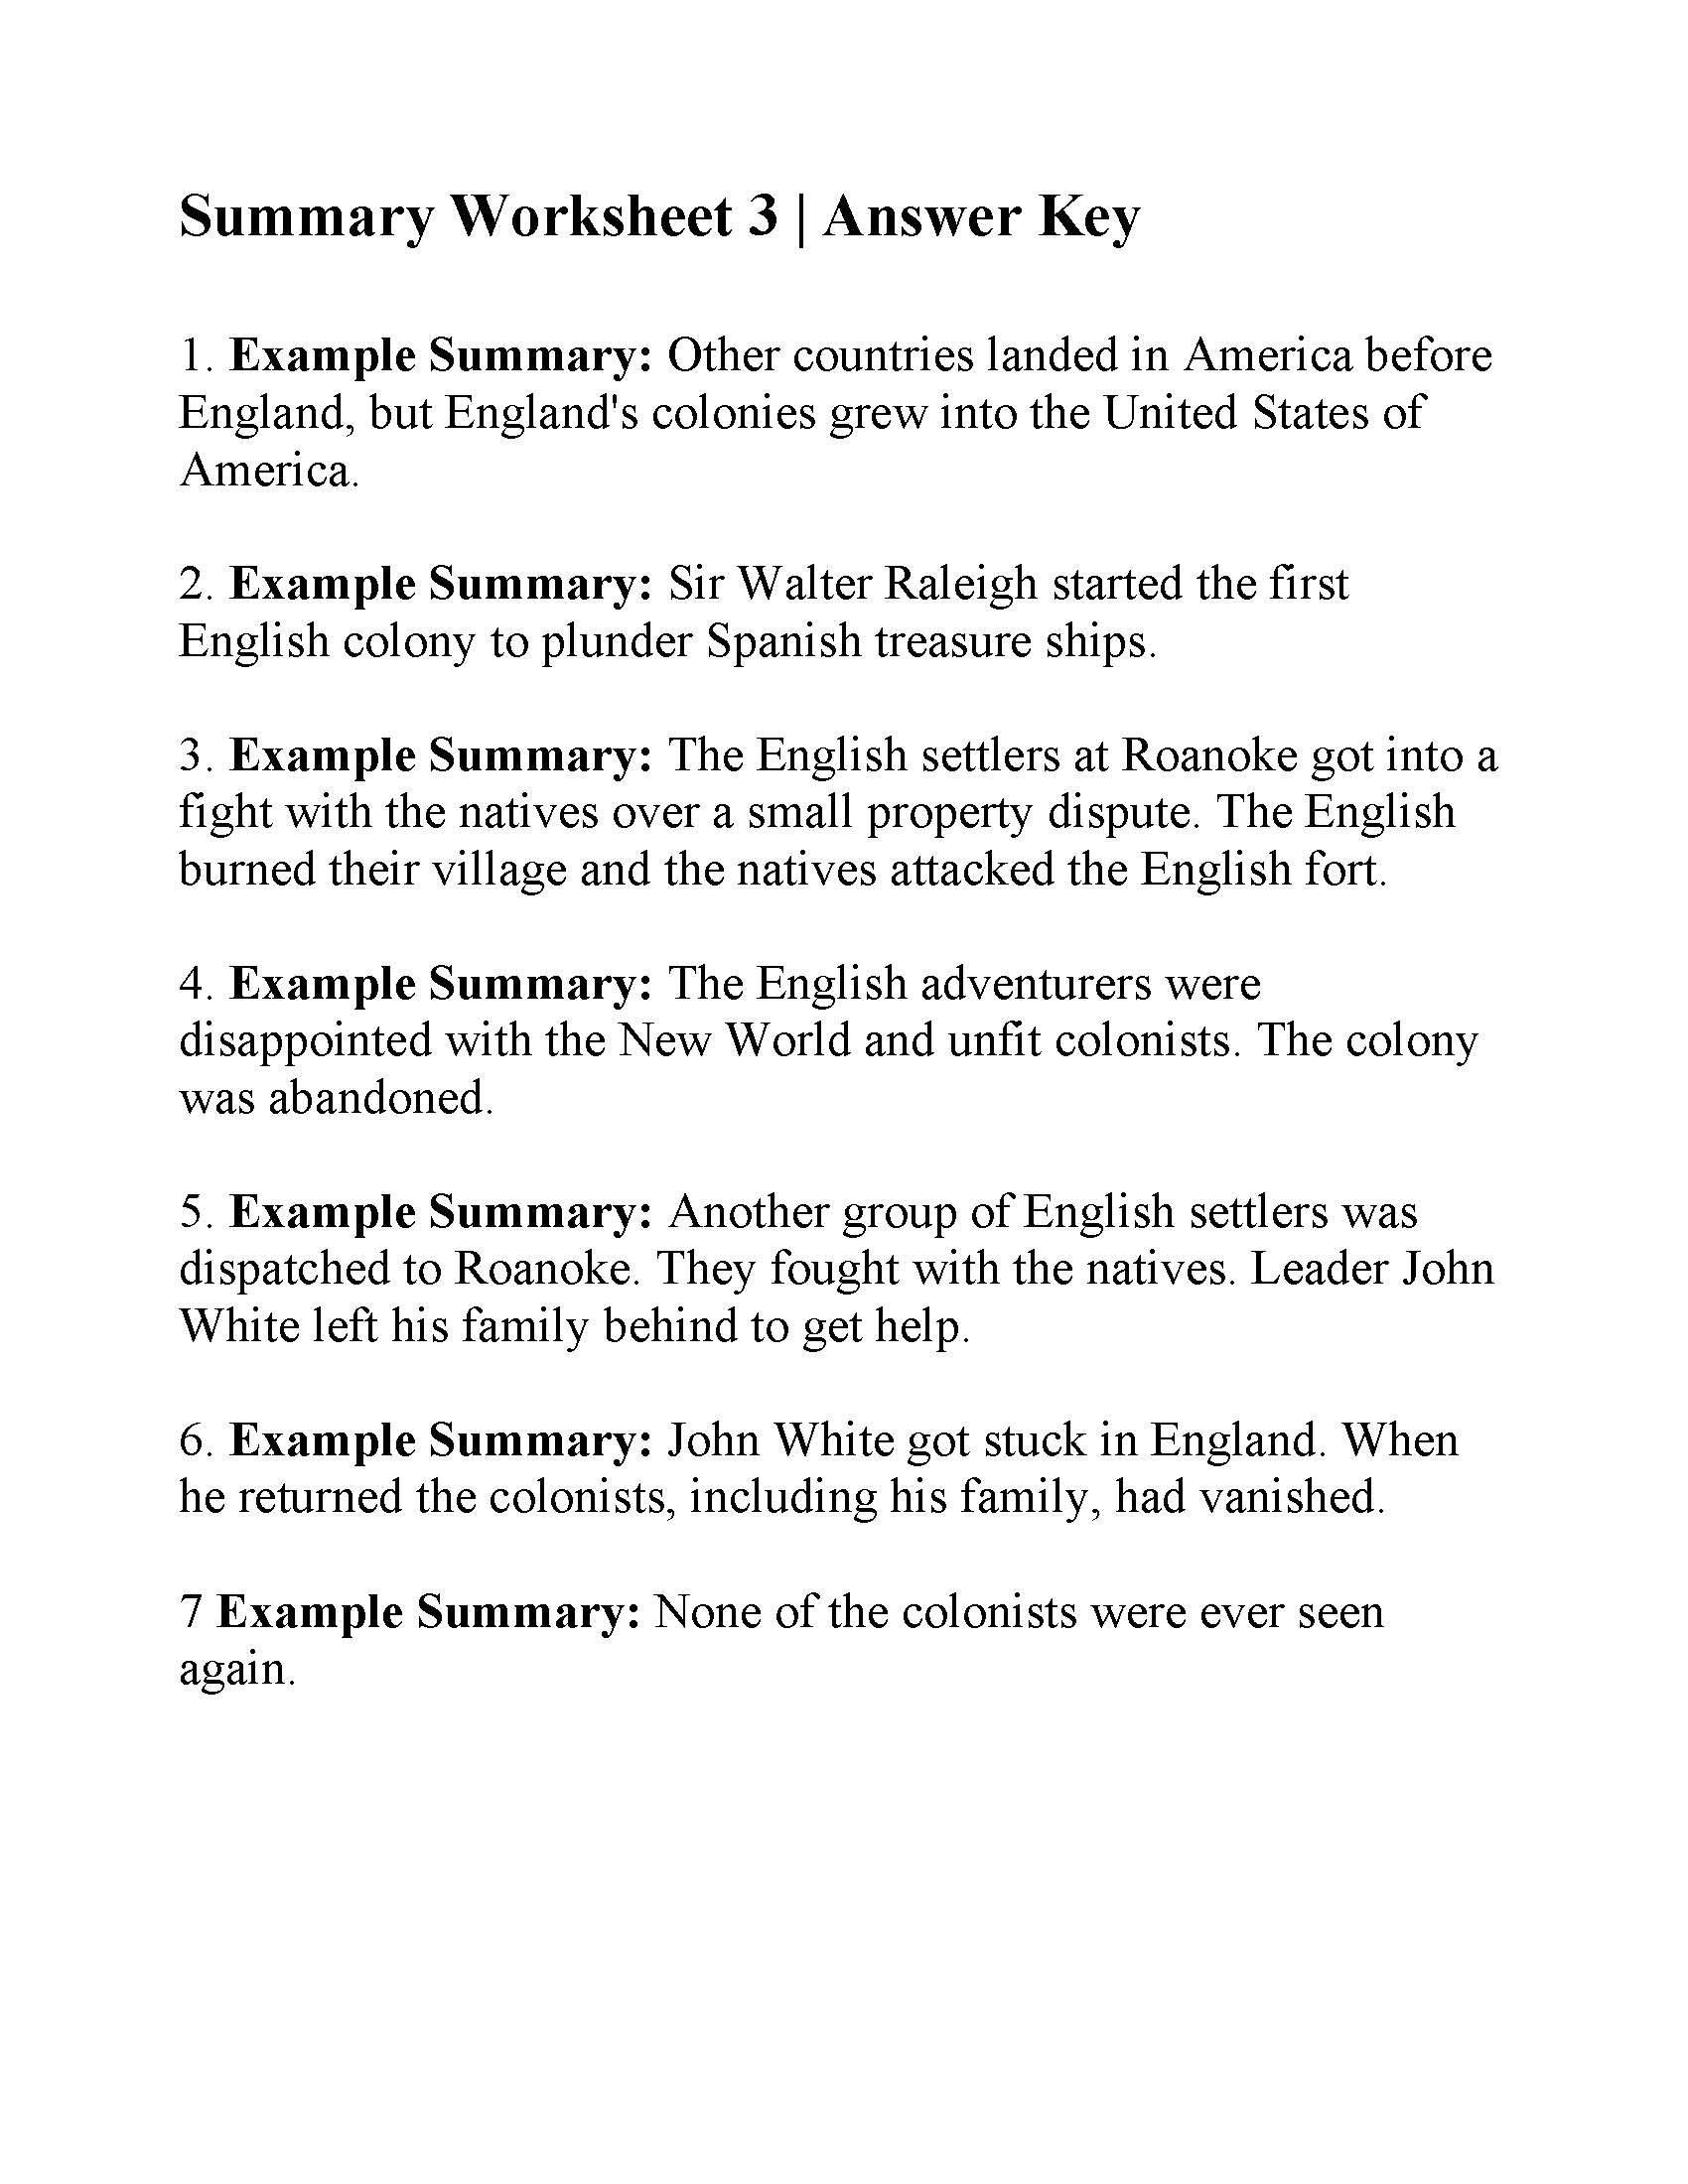 medium resolution of This is the answer key for the Summary Worksheet 3.   Summarizing worksheet